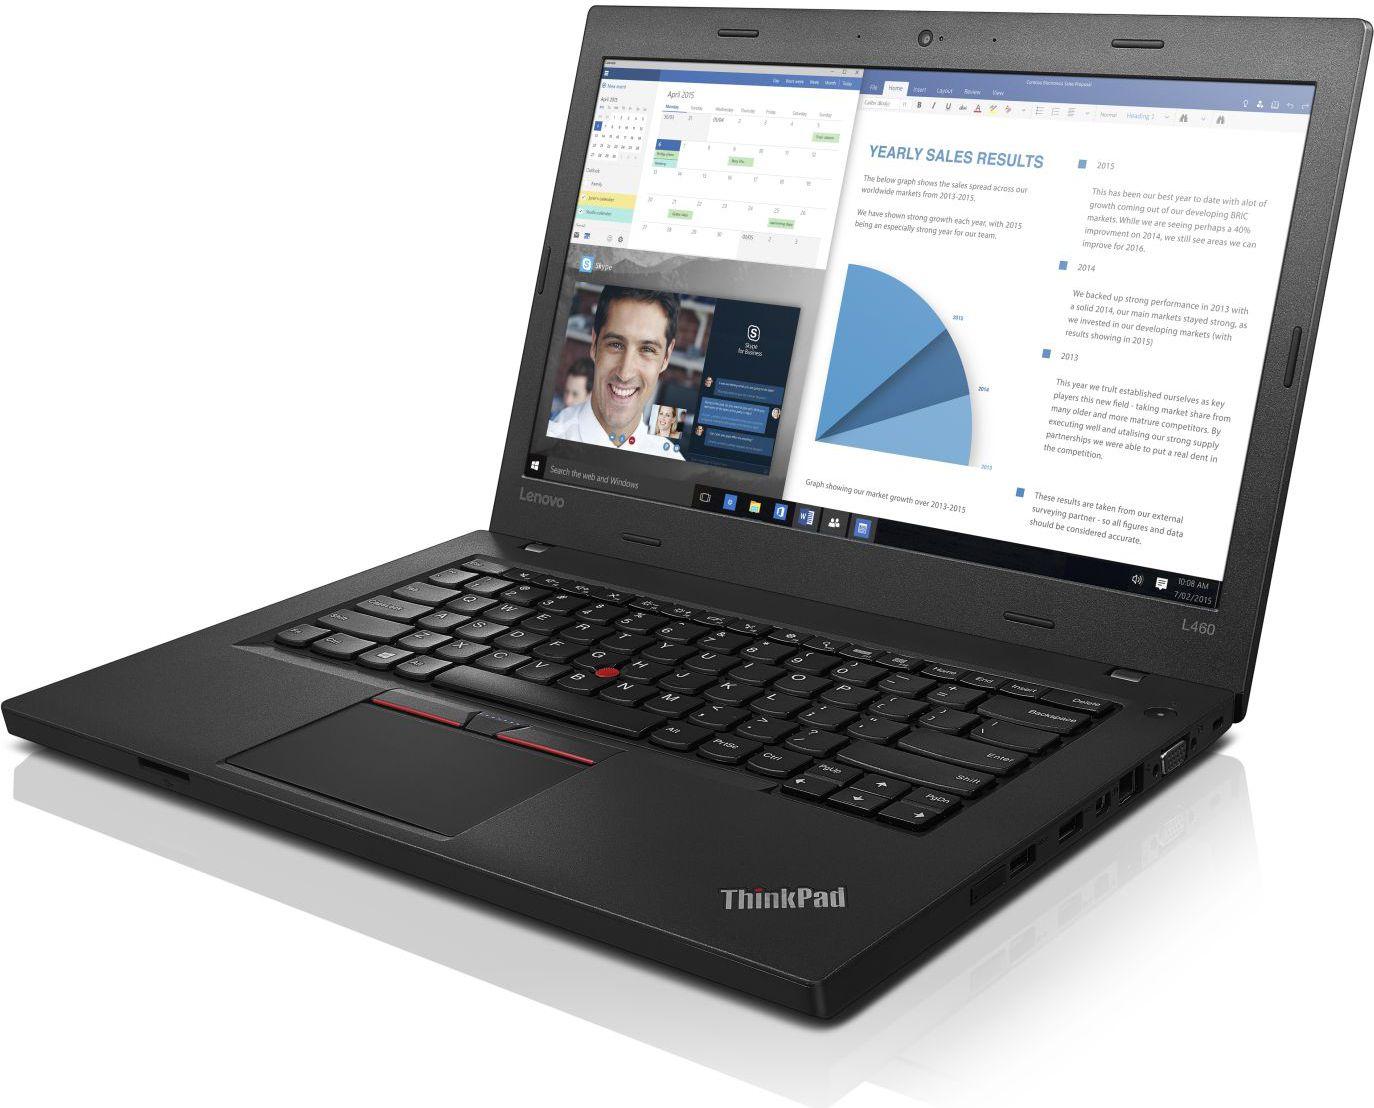 Ekran Lenovo ThinkPad L460